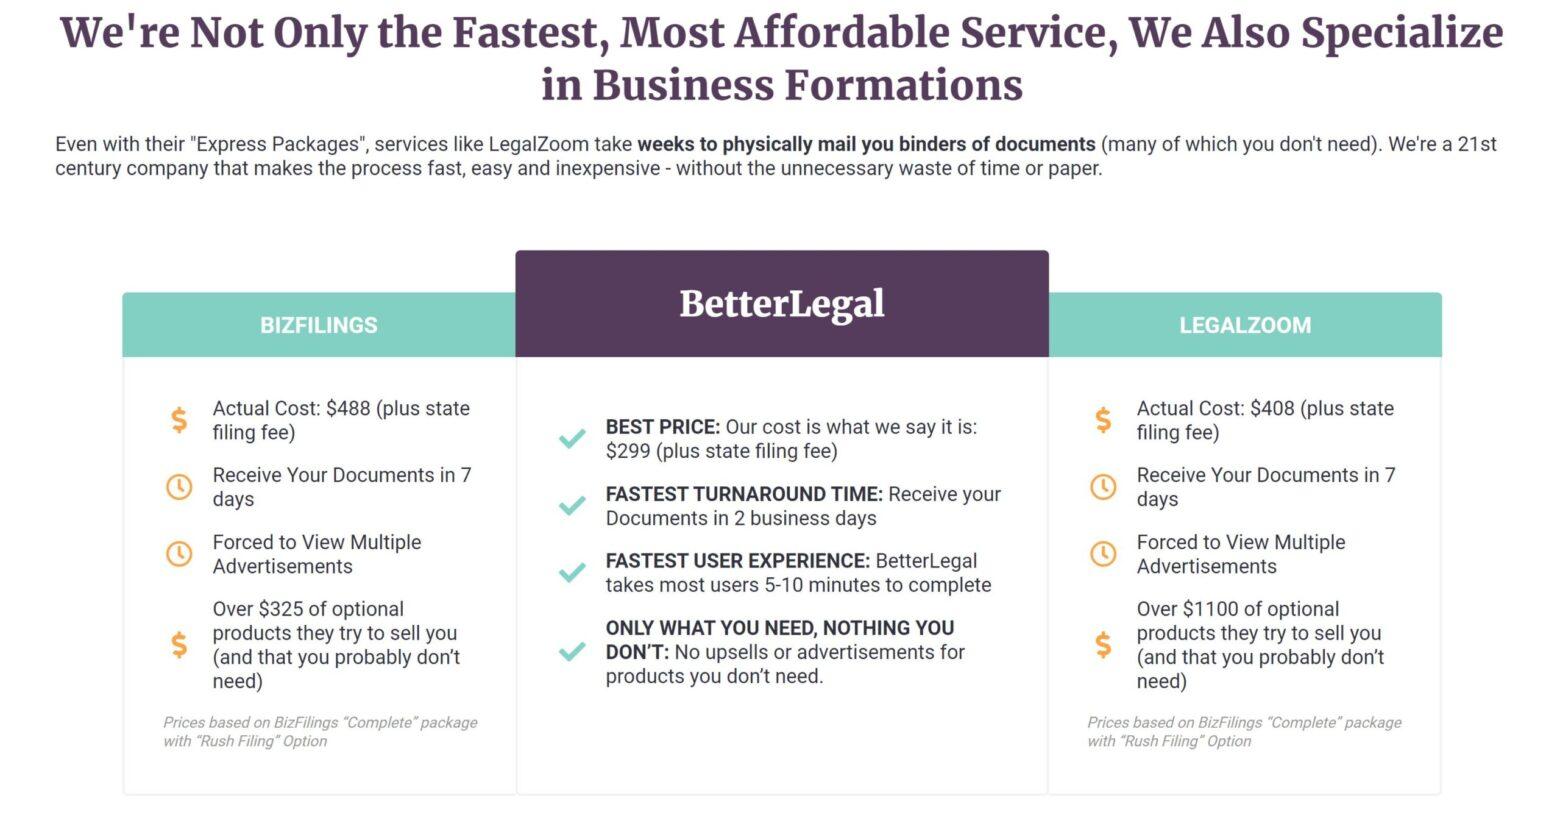 BetterLegal vs LegalZoom LLC service